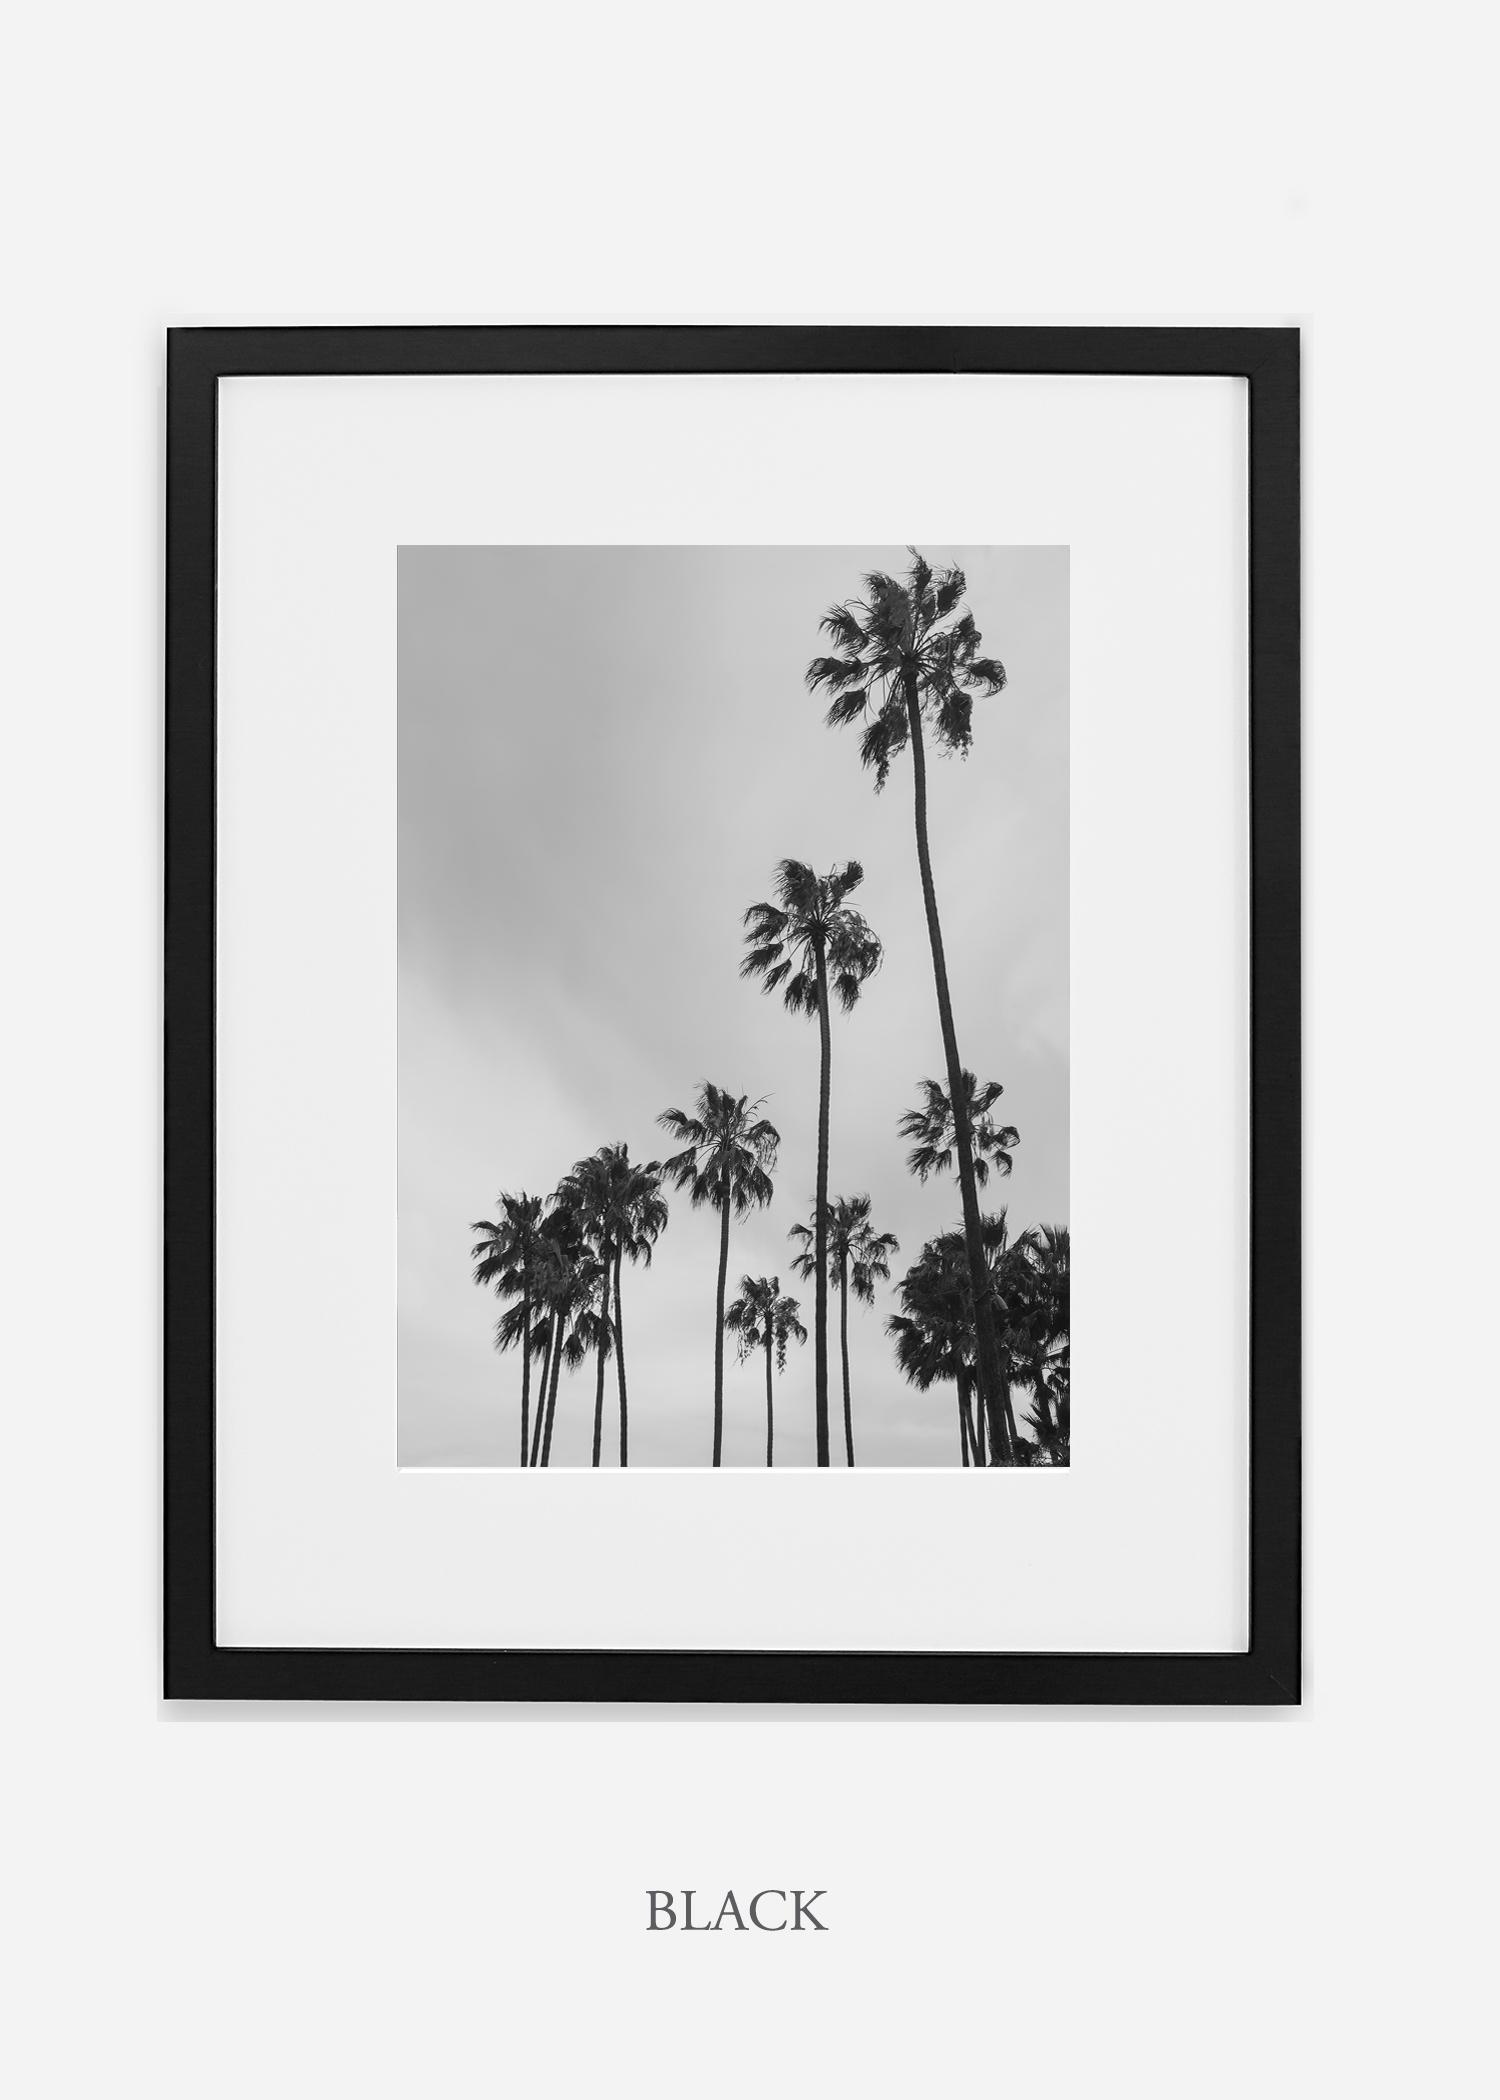 interiordesign_california_losangeles_palmtree_blackframe.jpg